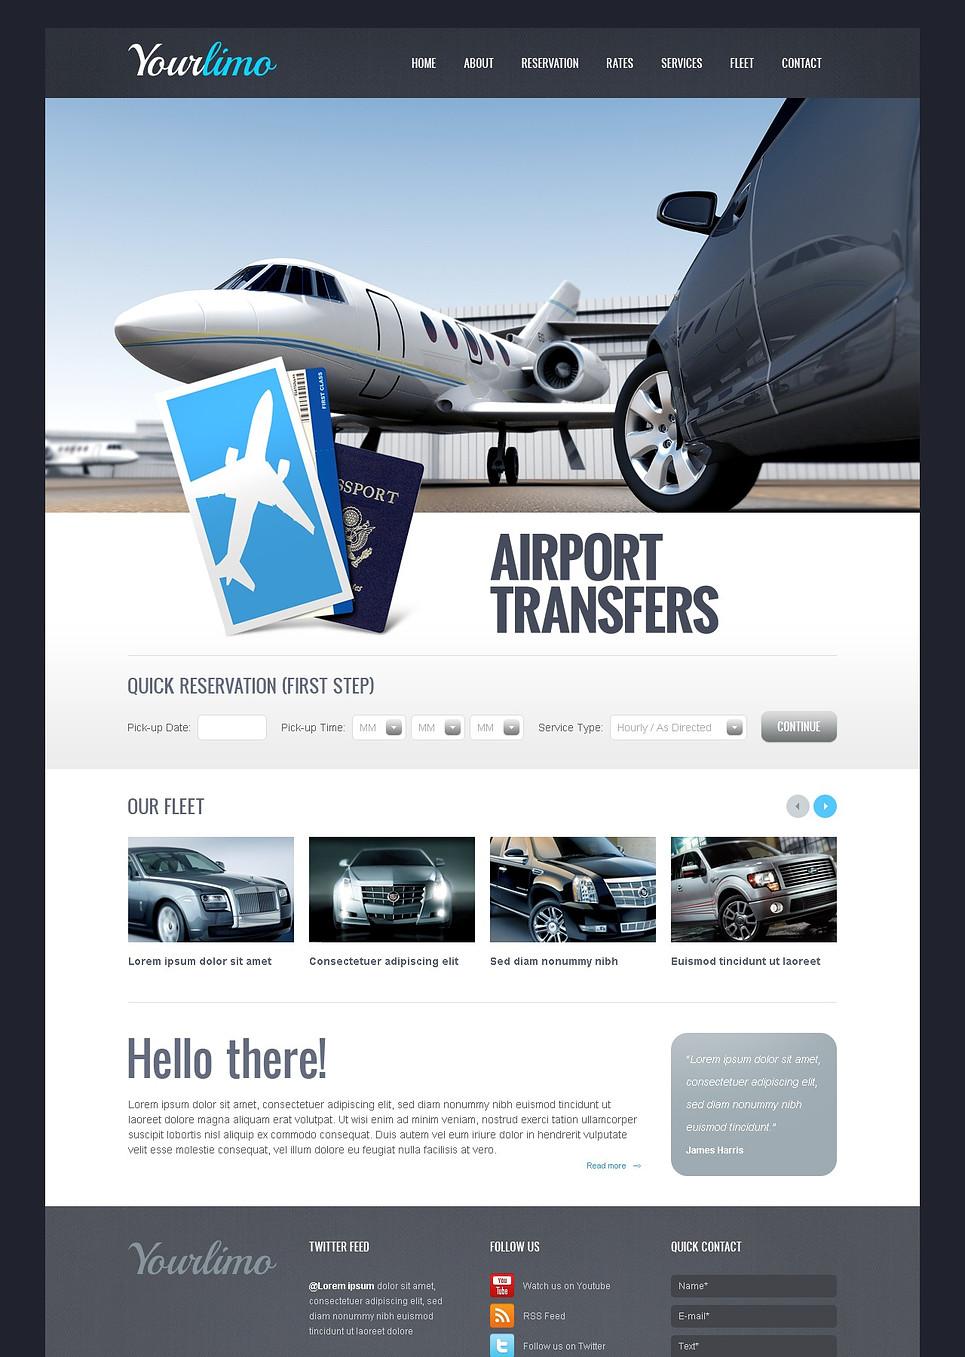 Limousine Transportation Company Website Template - image